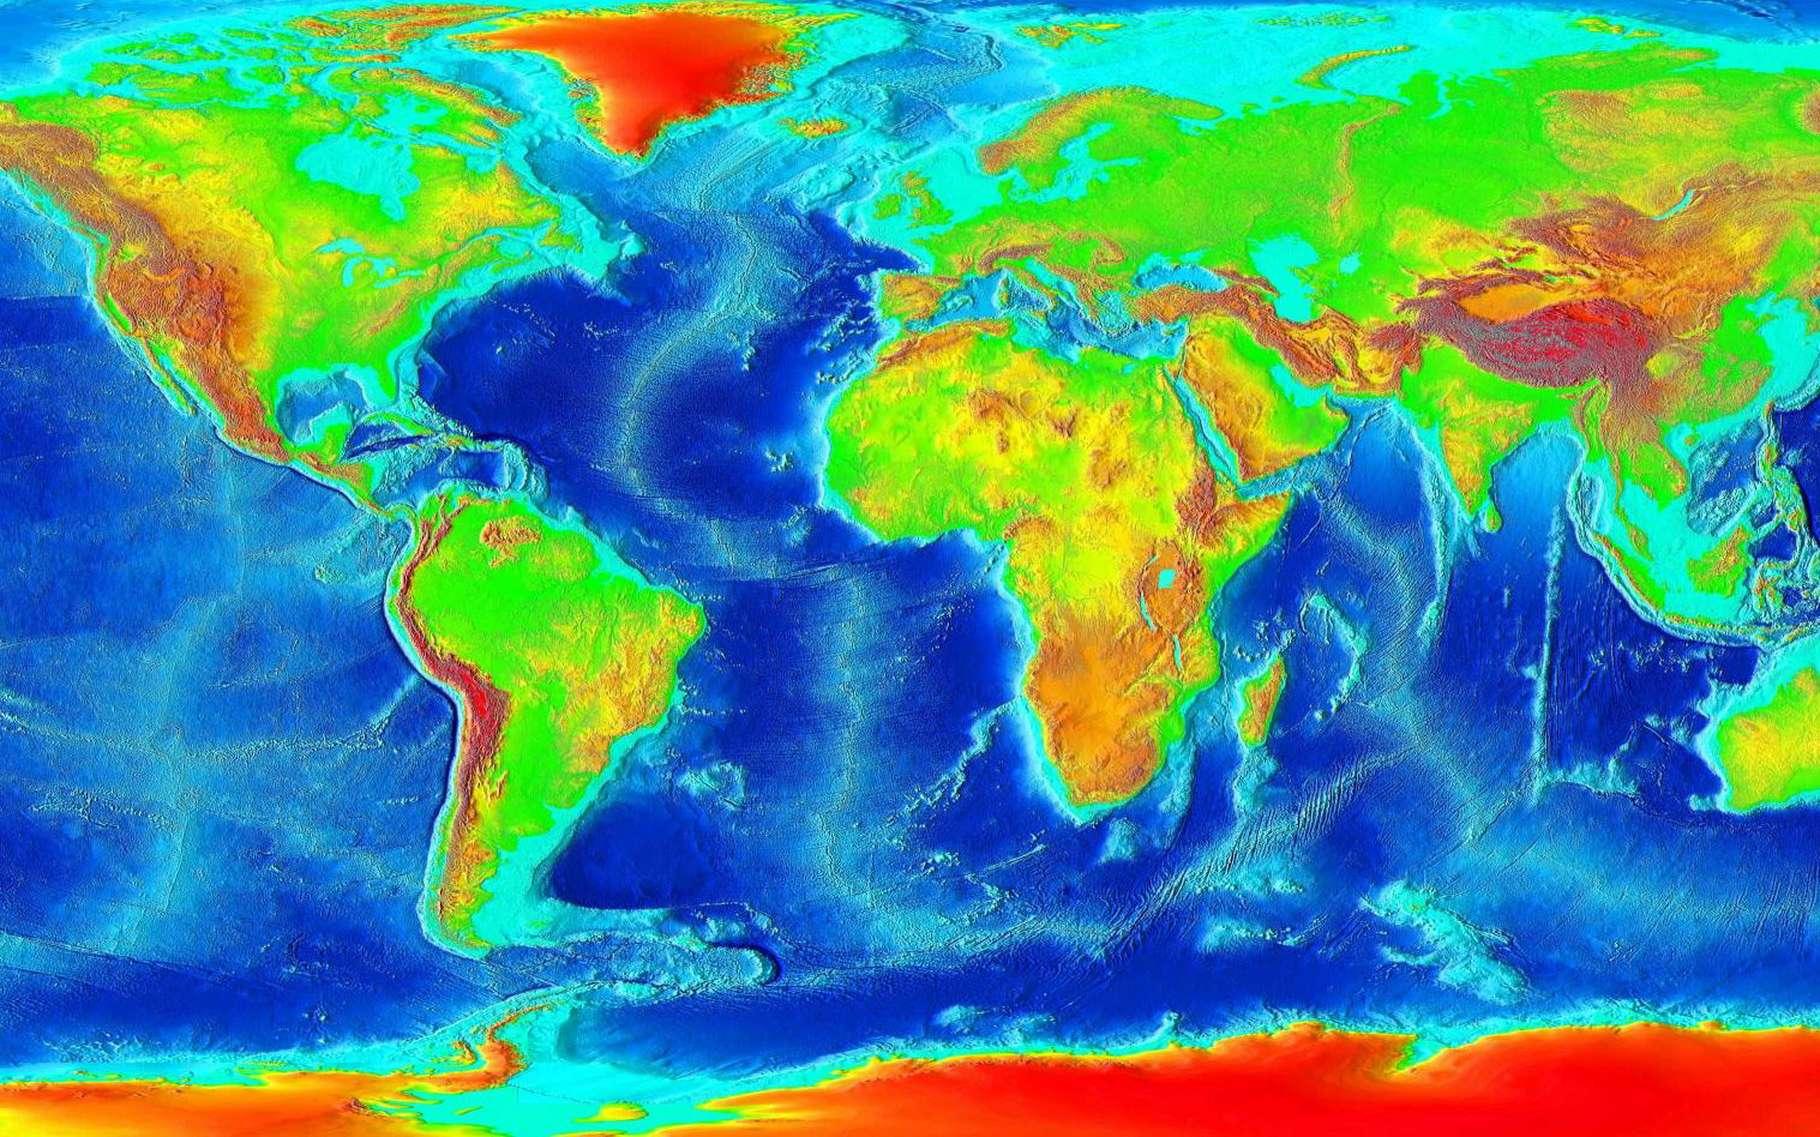 Carte du monde. © Tahaisik, Wikimedia commons, CC by-sa 3.0